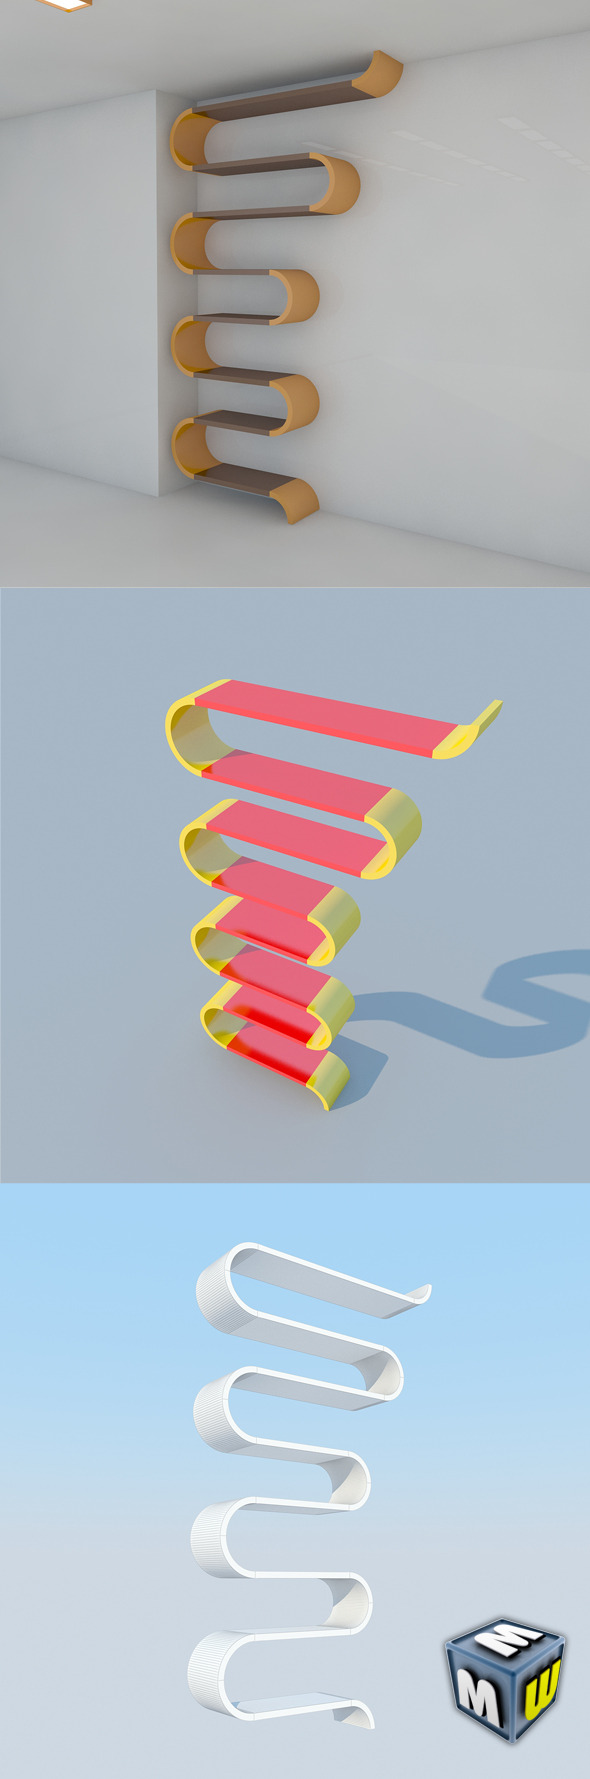 Bookshelf 8 MAX 2011 - 3DOcean Item for Sale